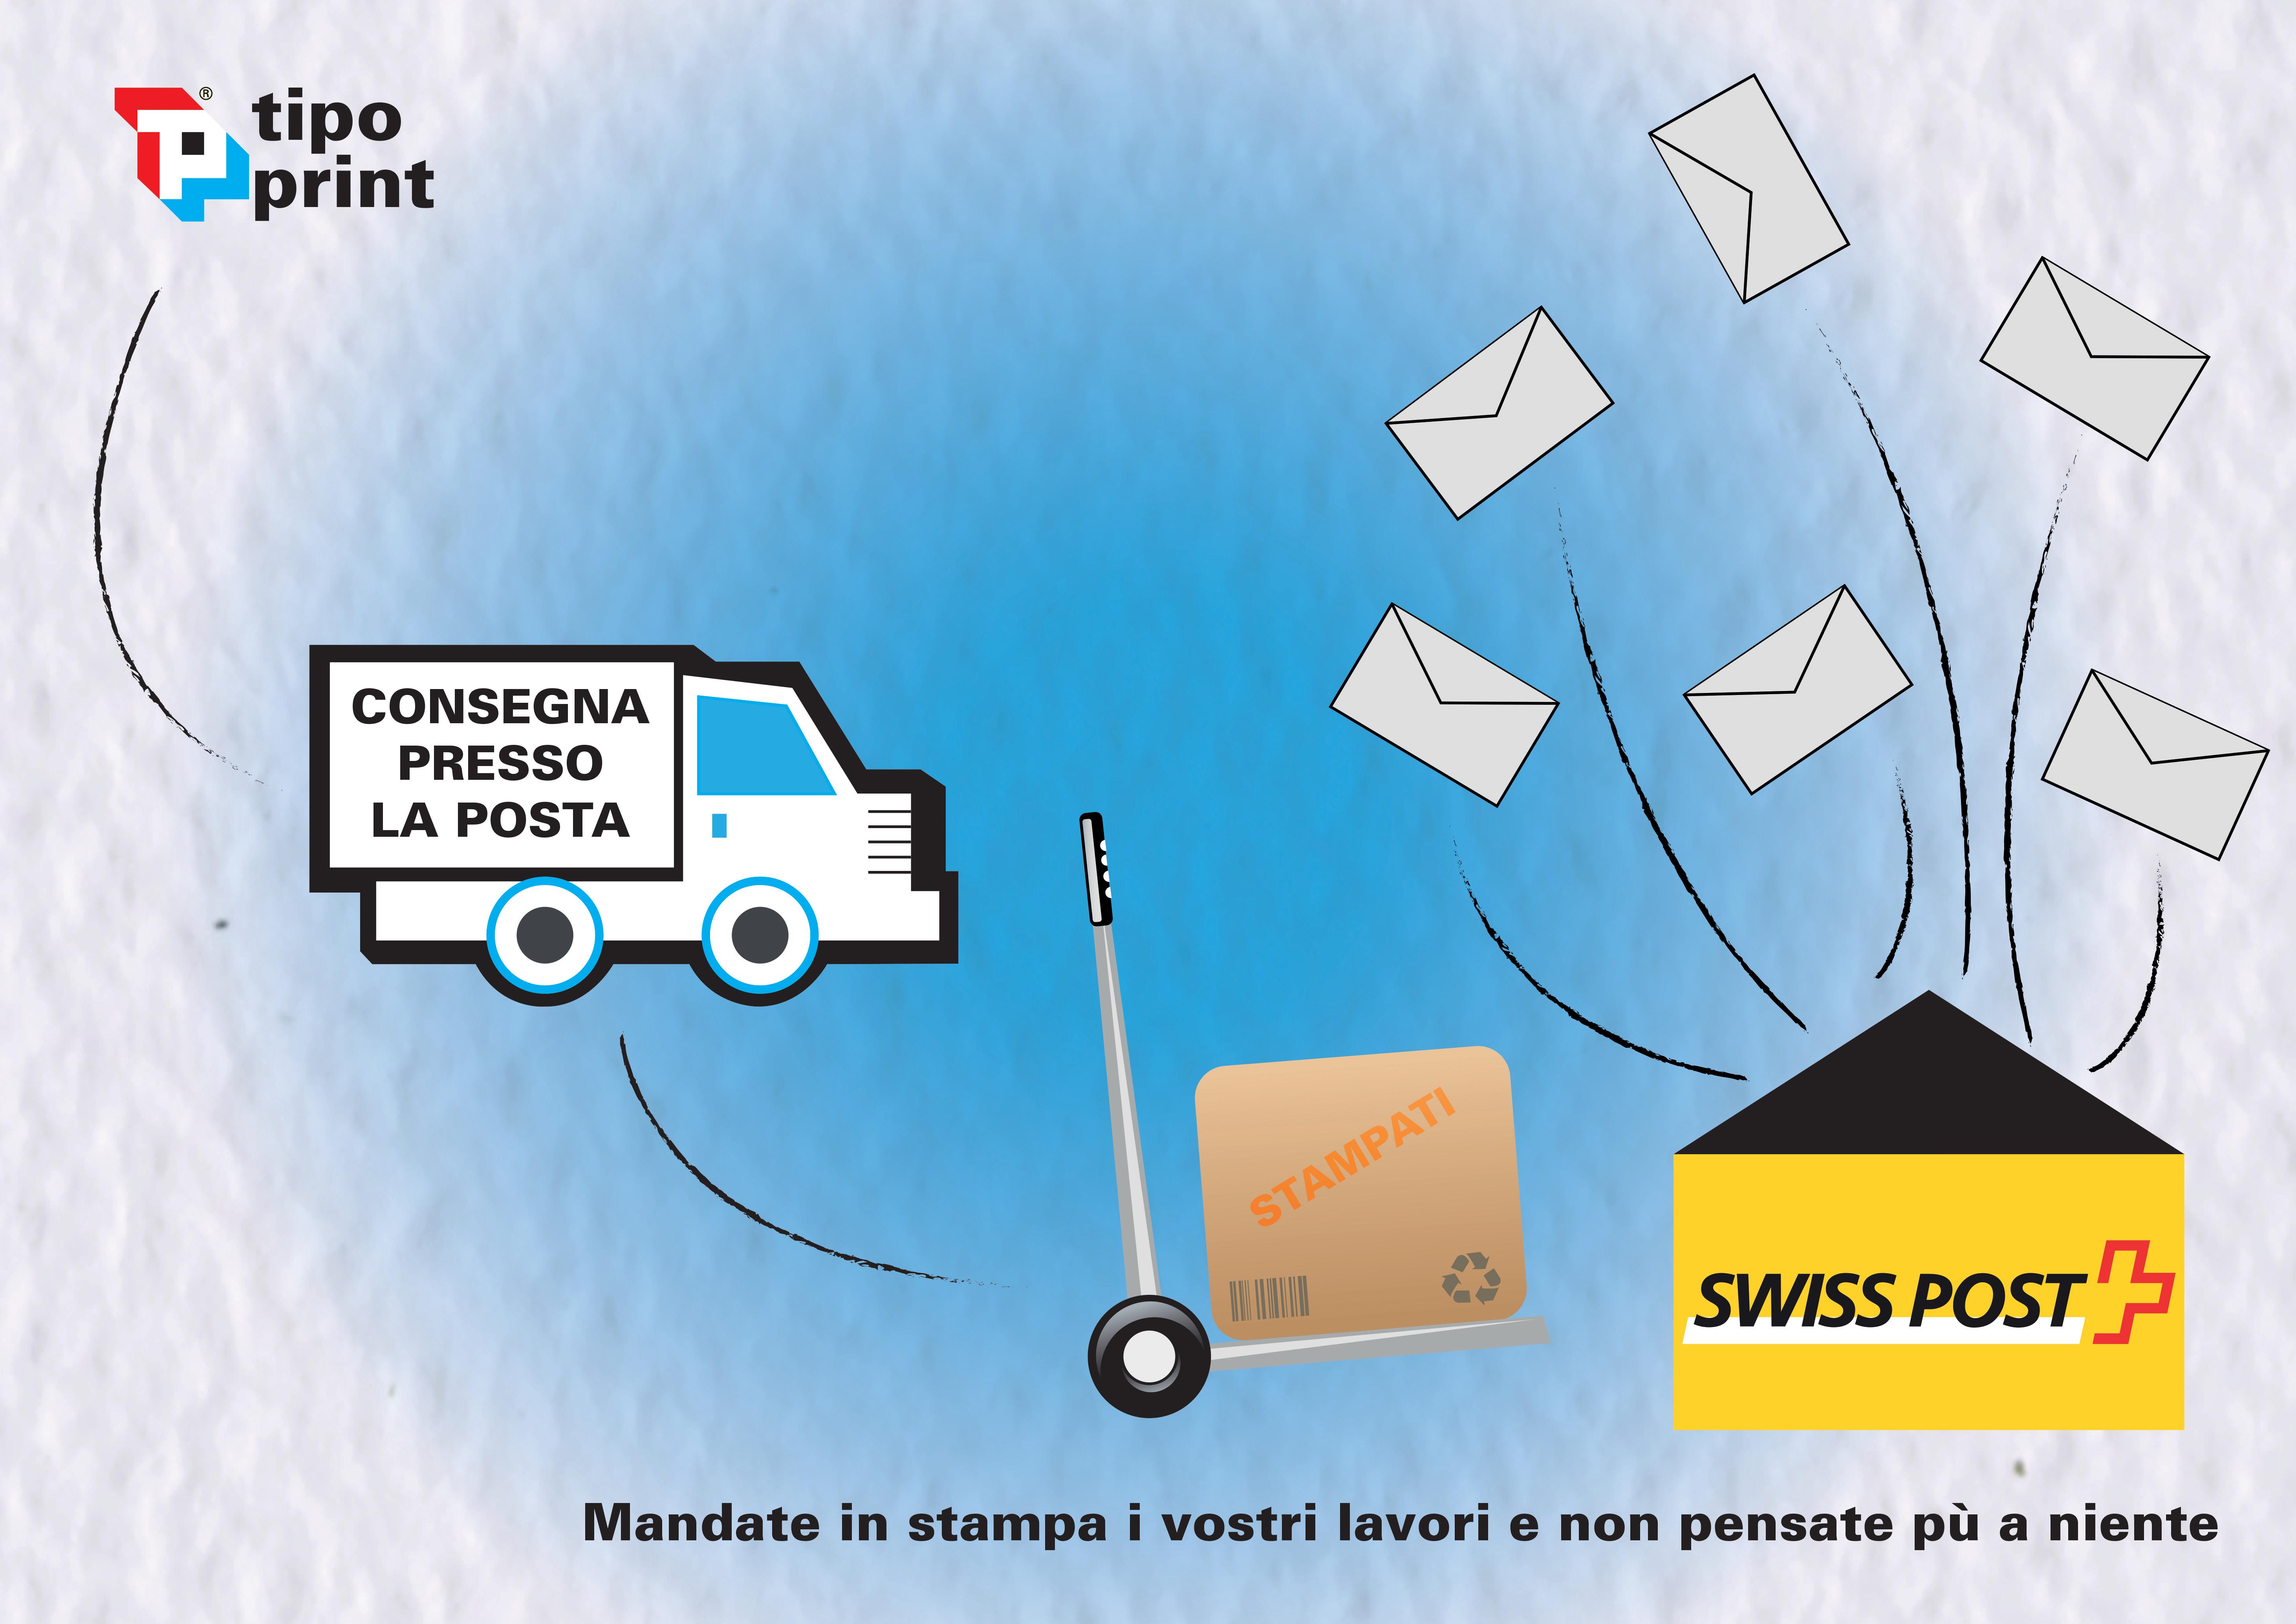 Consegna posta